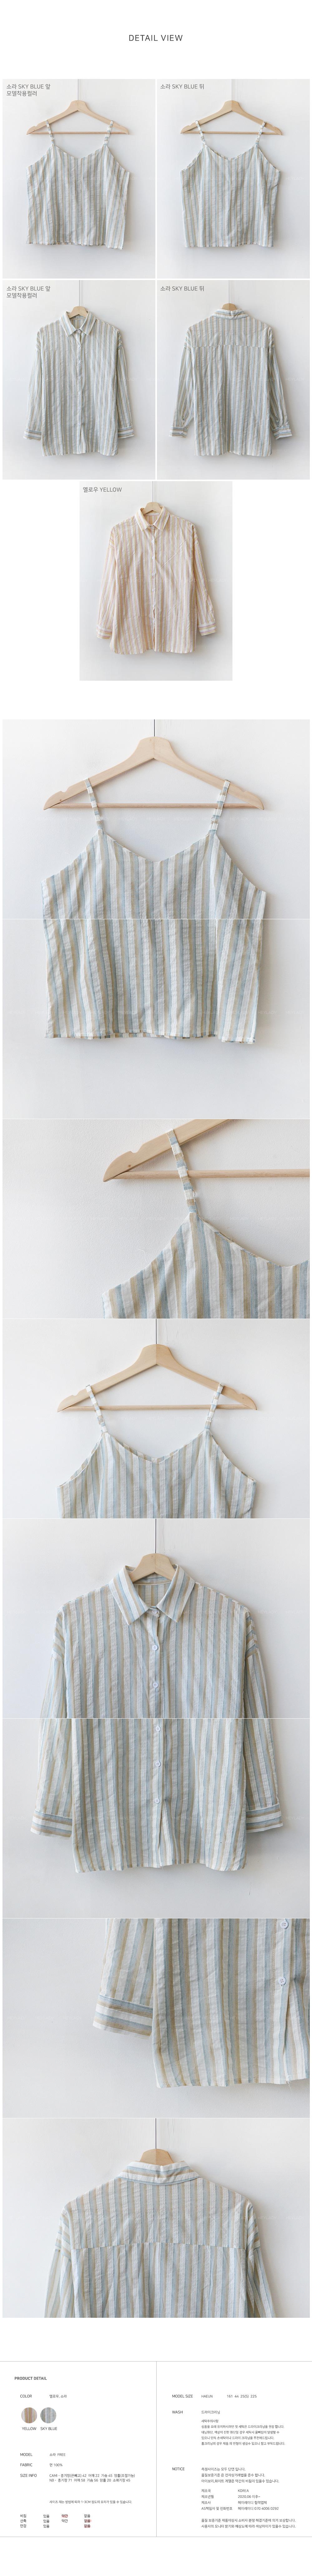 Michigan Sleeveless Set Shirt